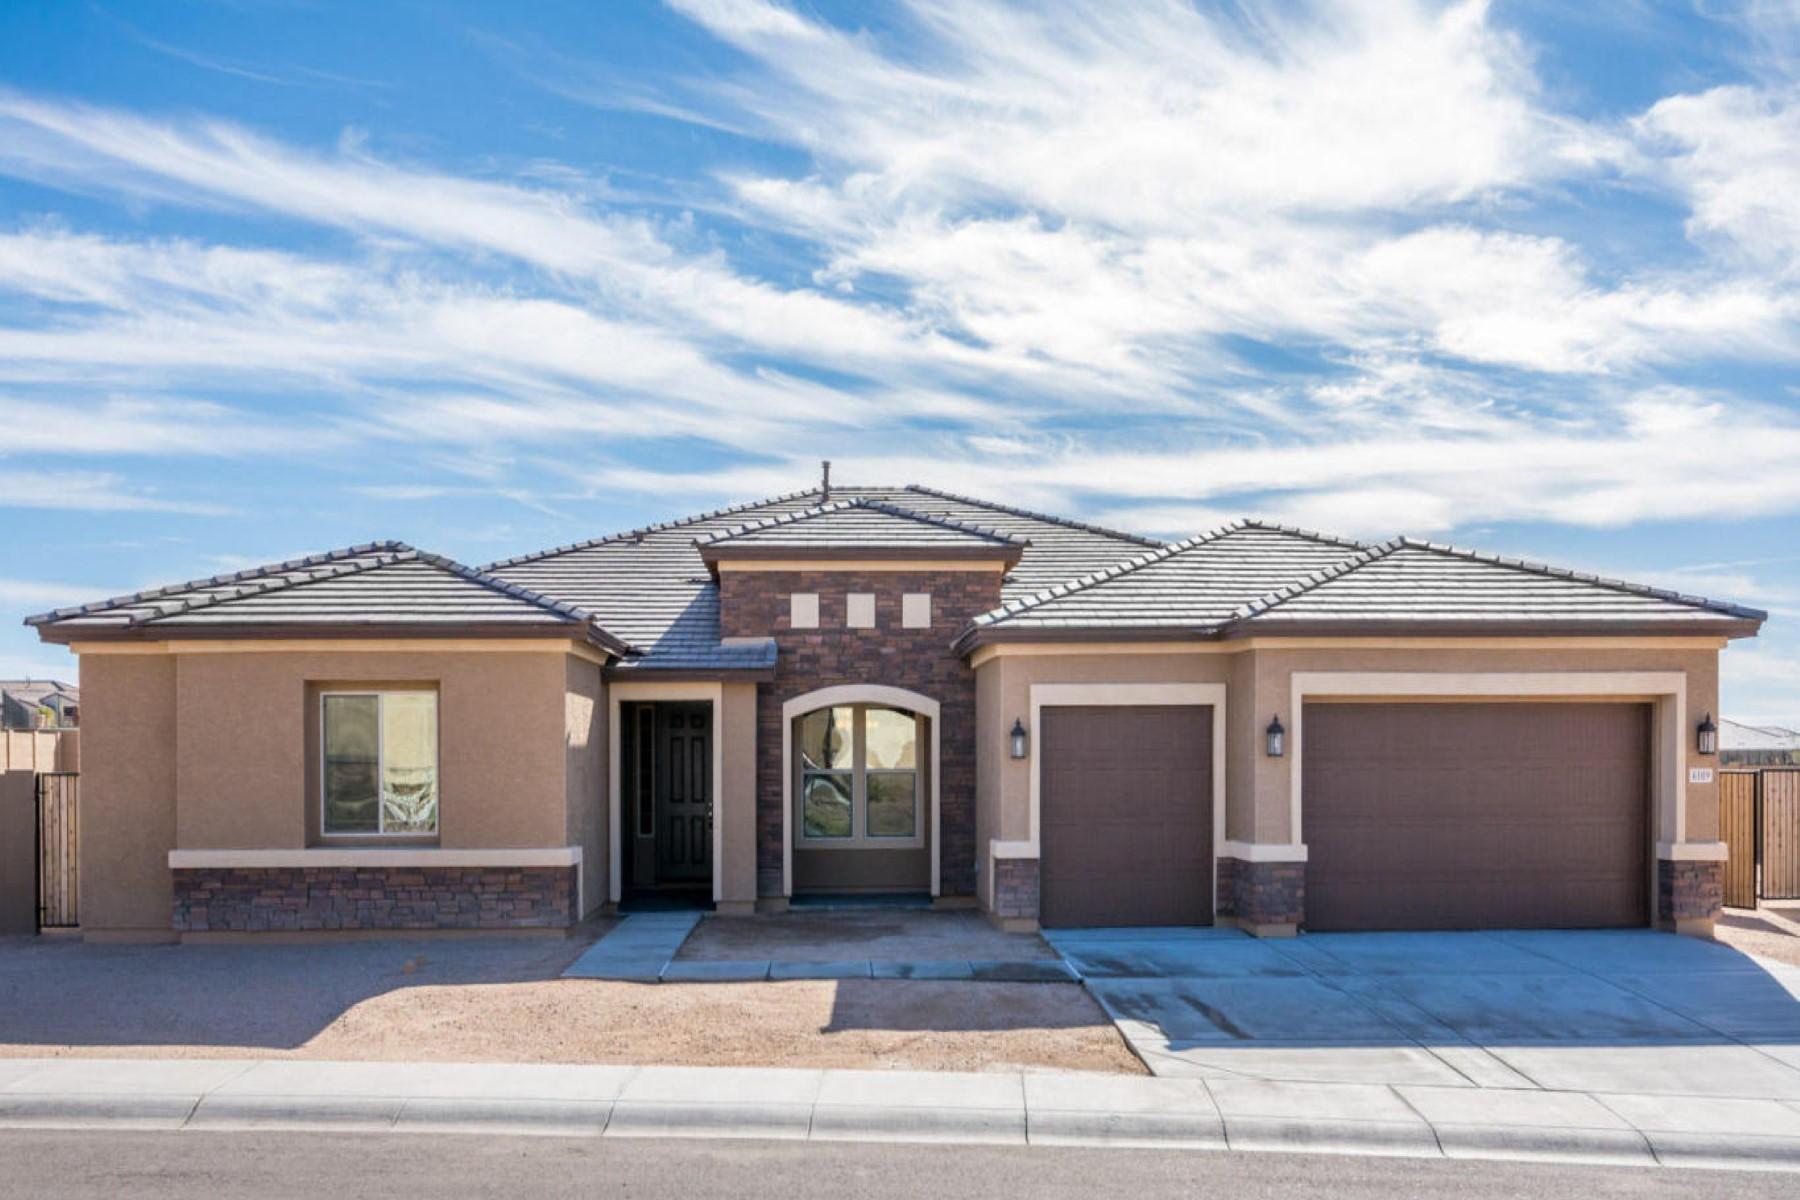 Частный односемейный дом для того Продажа на Sensational brand new home built by Richmond American Homes 6109 E Hodges St Cave Creek, Аризона 85331 Соединенные Штаты